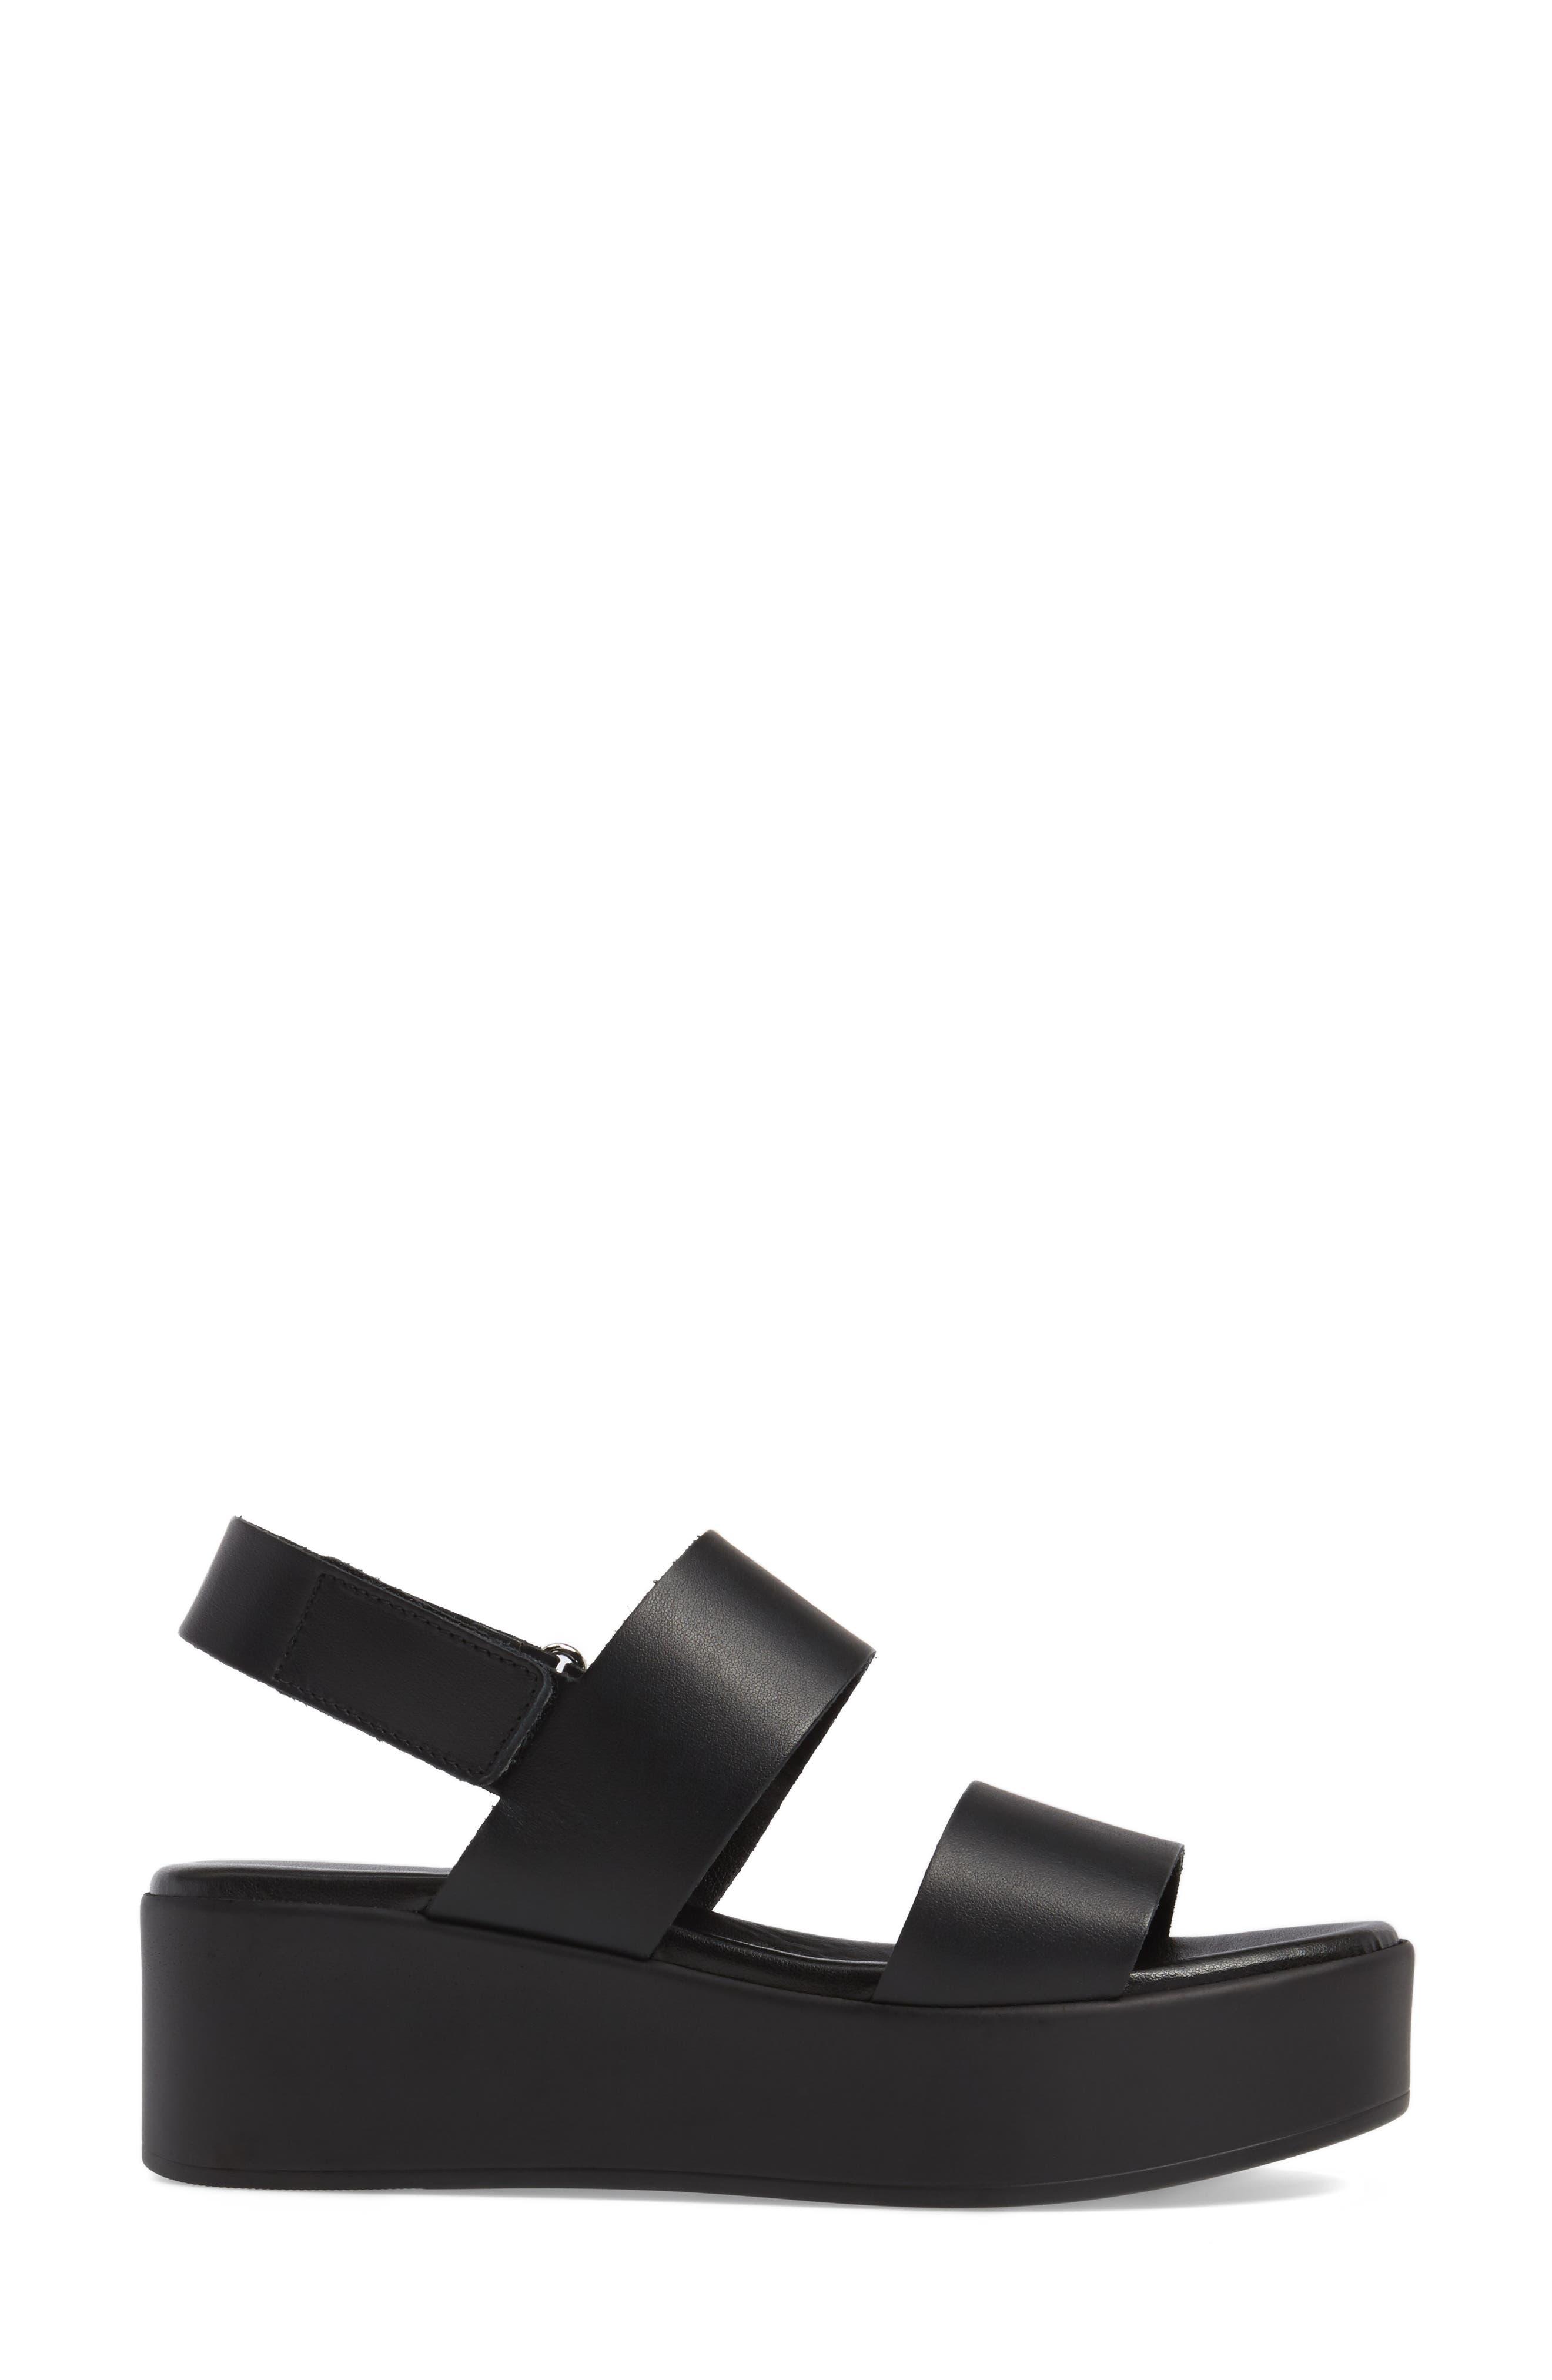 Rachel Platform Wedge Sandal,                             Alternate thumbnail 13, color,